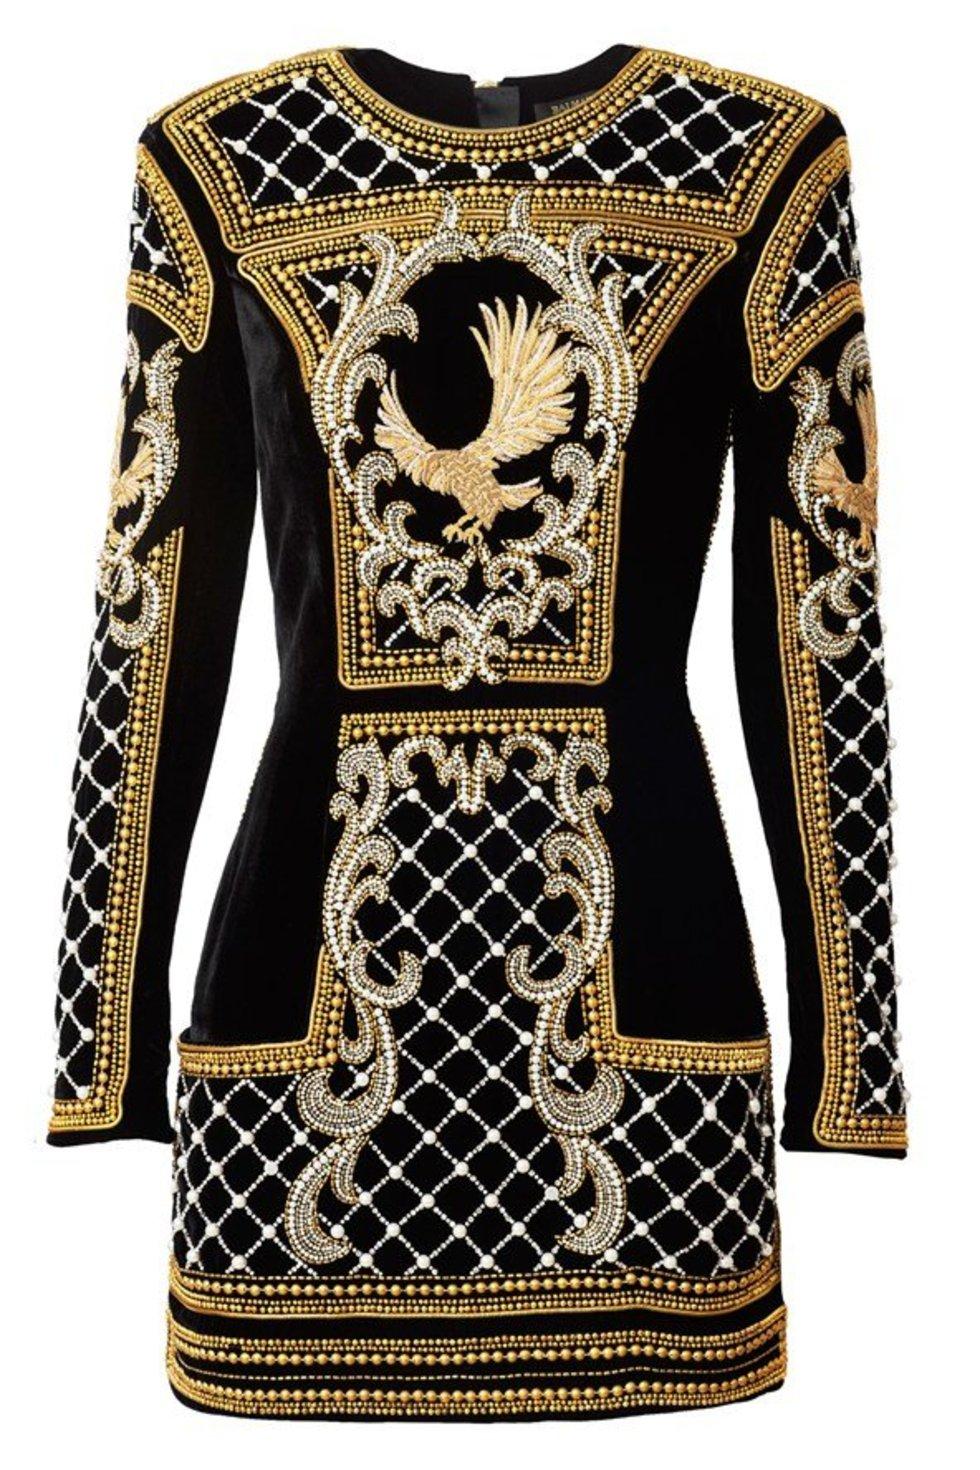 Gold and Black Beaded Dress (Image: stylist.co.uk)